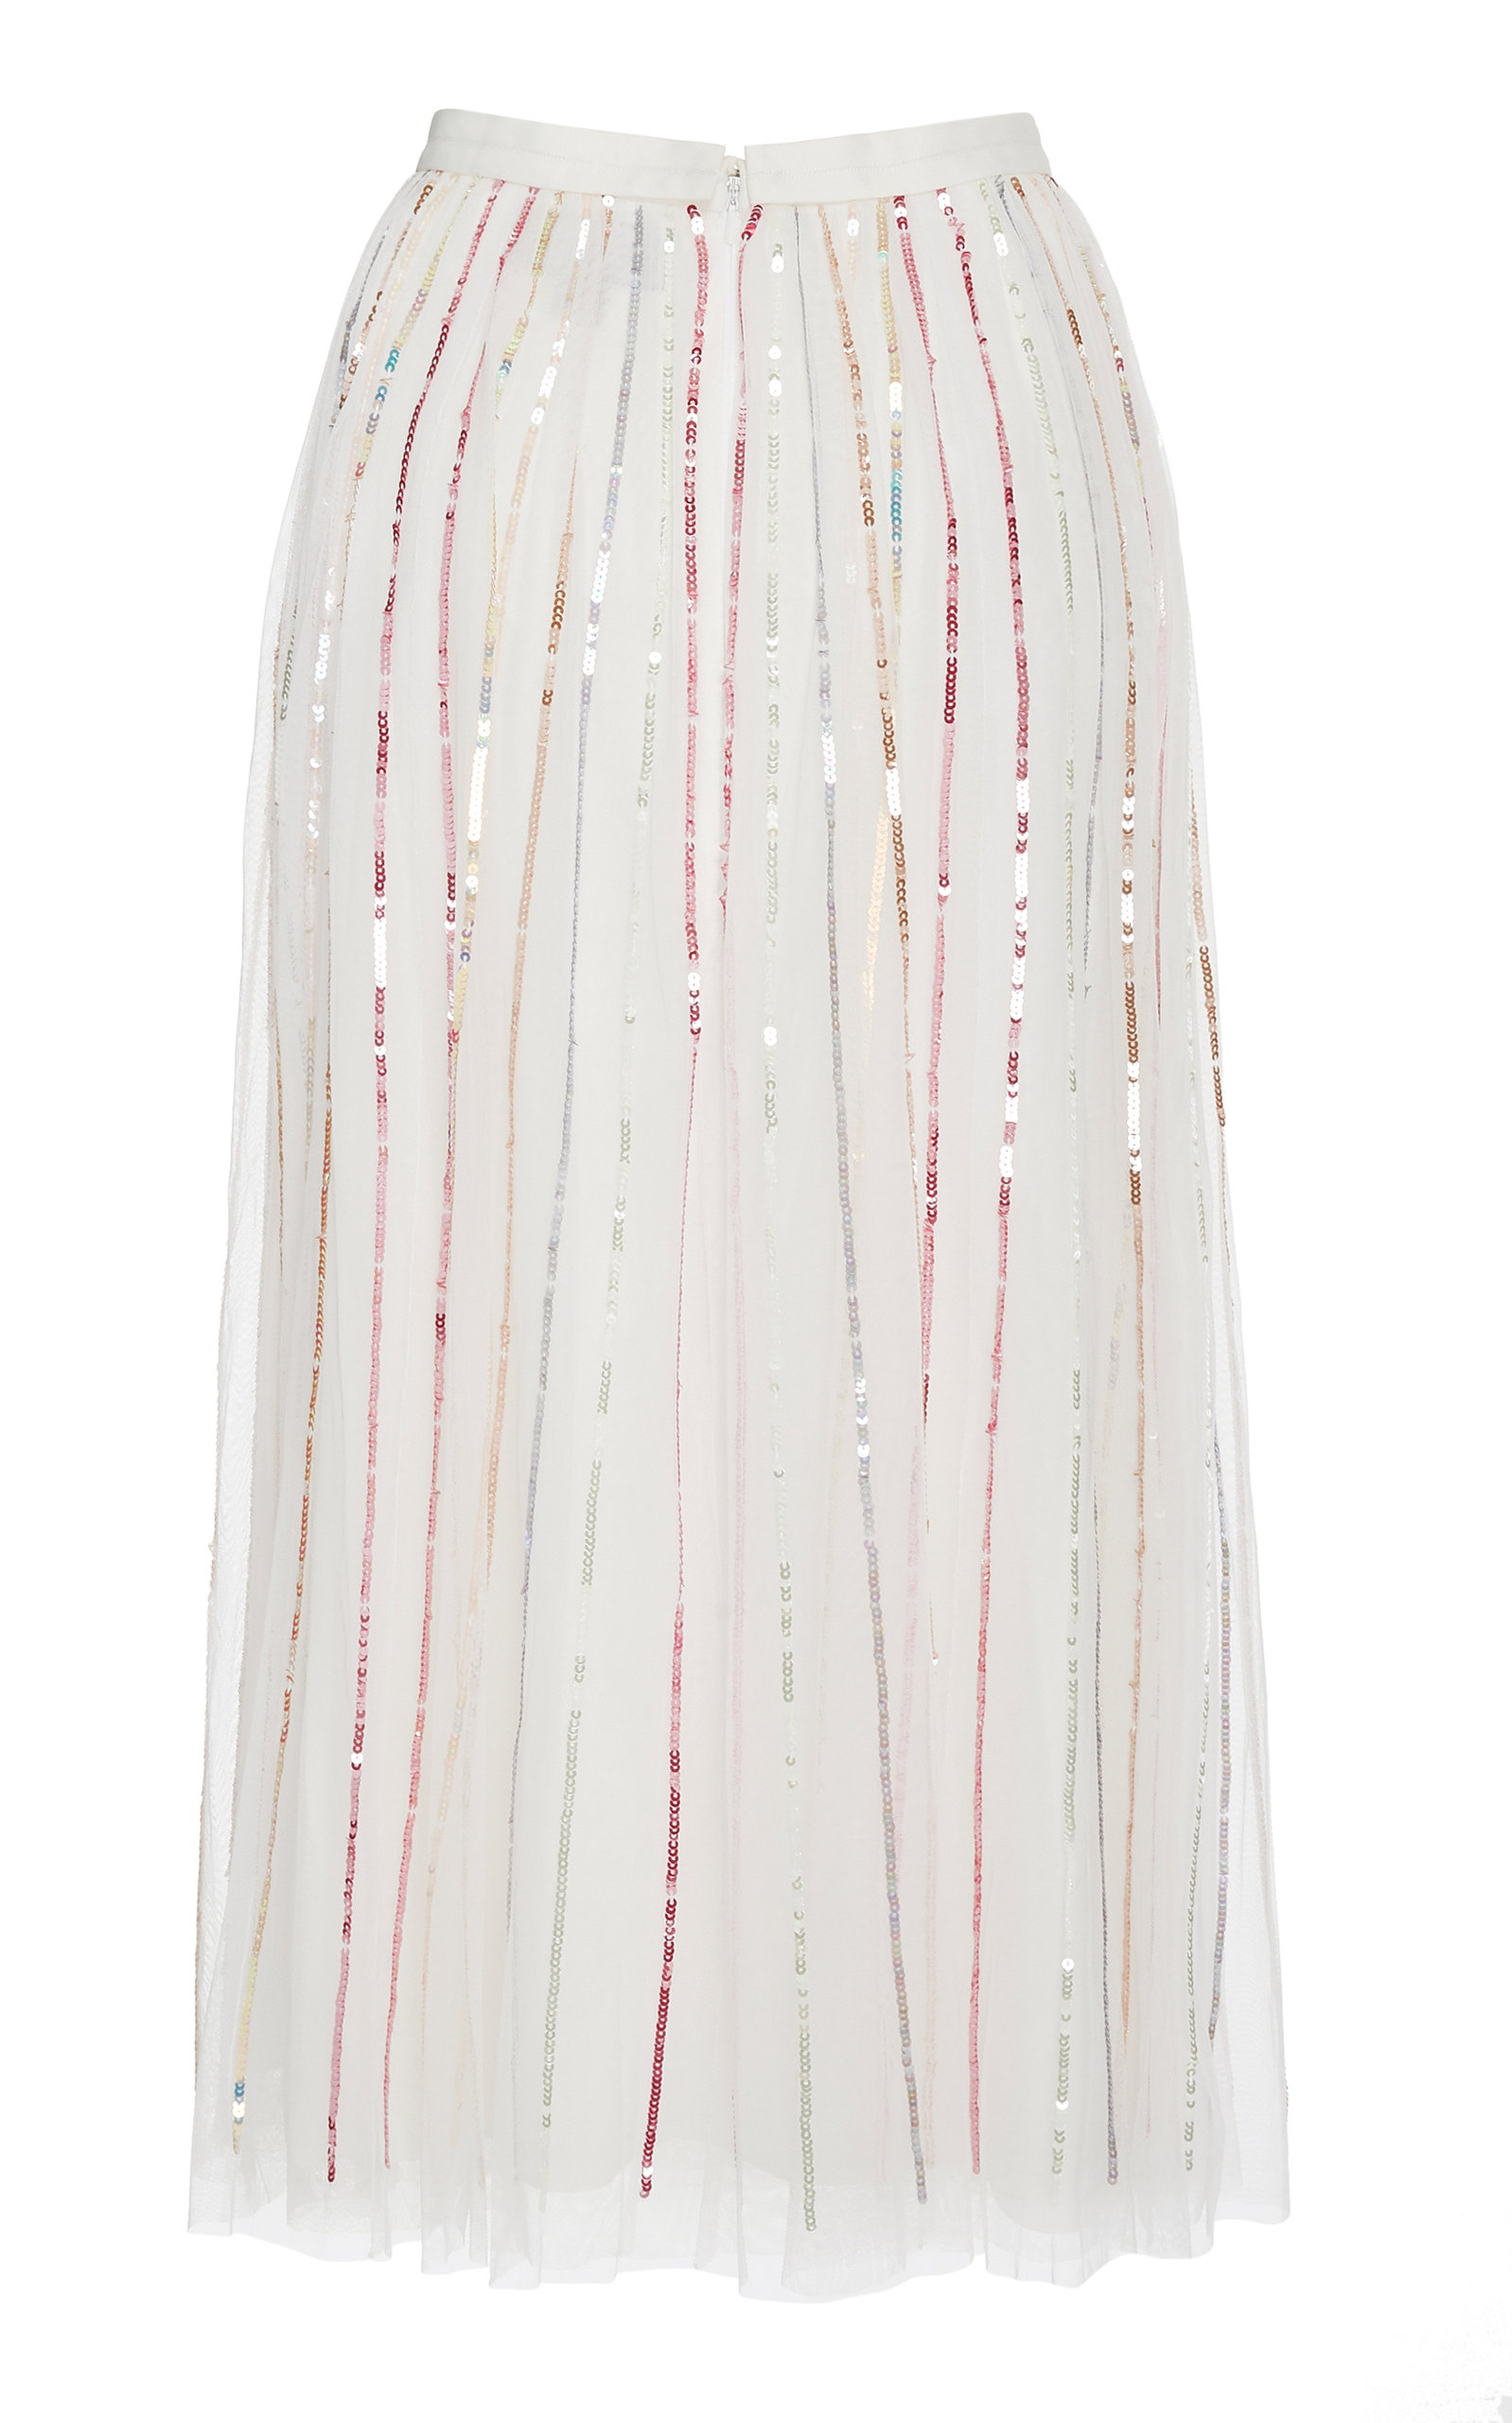 a9016812c6 Needle & ThreadMidaxi shimmer sequin skirt. CLOSE. Loading. Loading